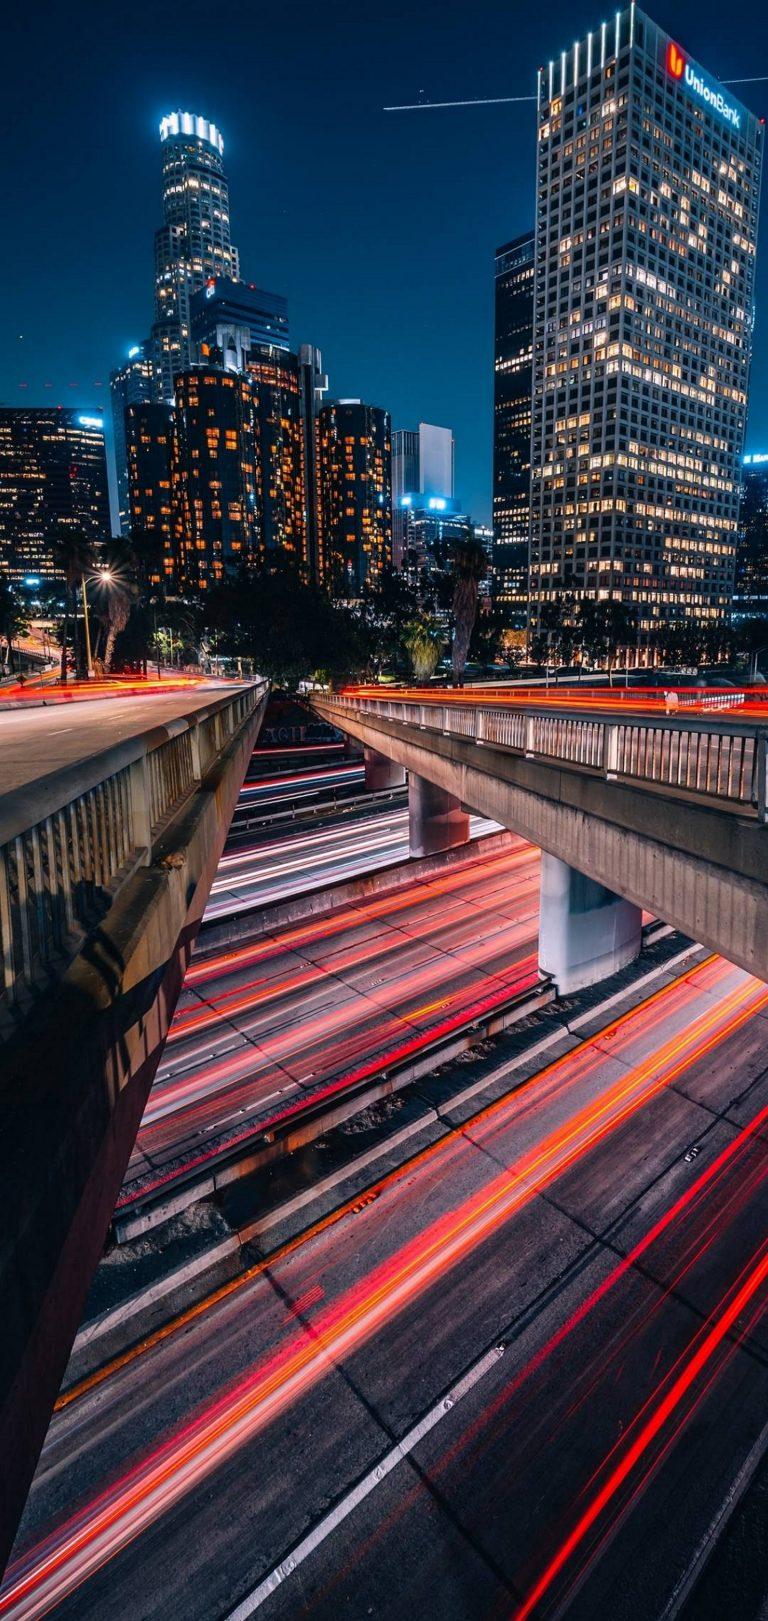 City Metropolis Los Angeles Wallpaper 1440x3040